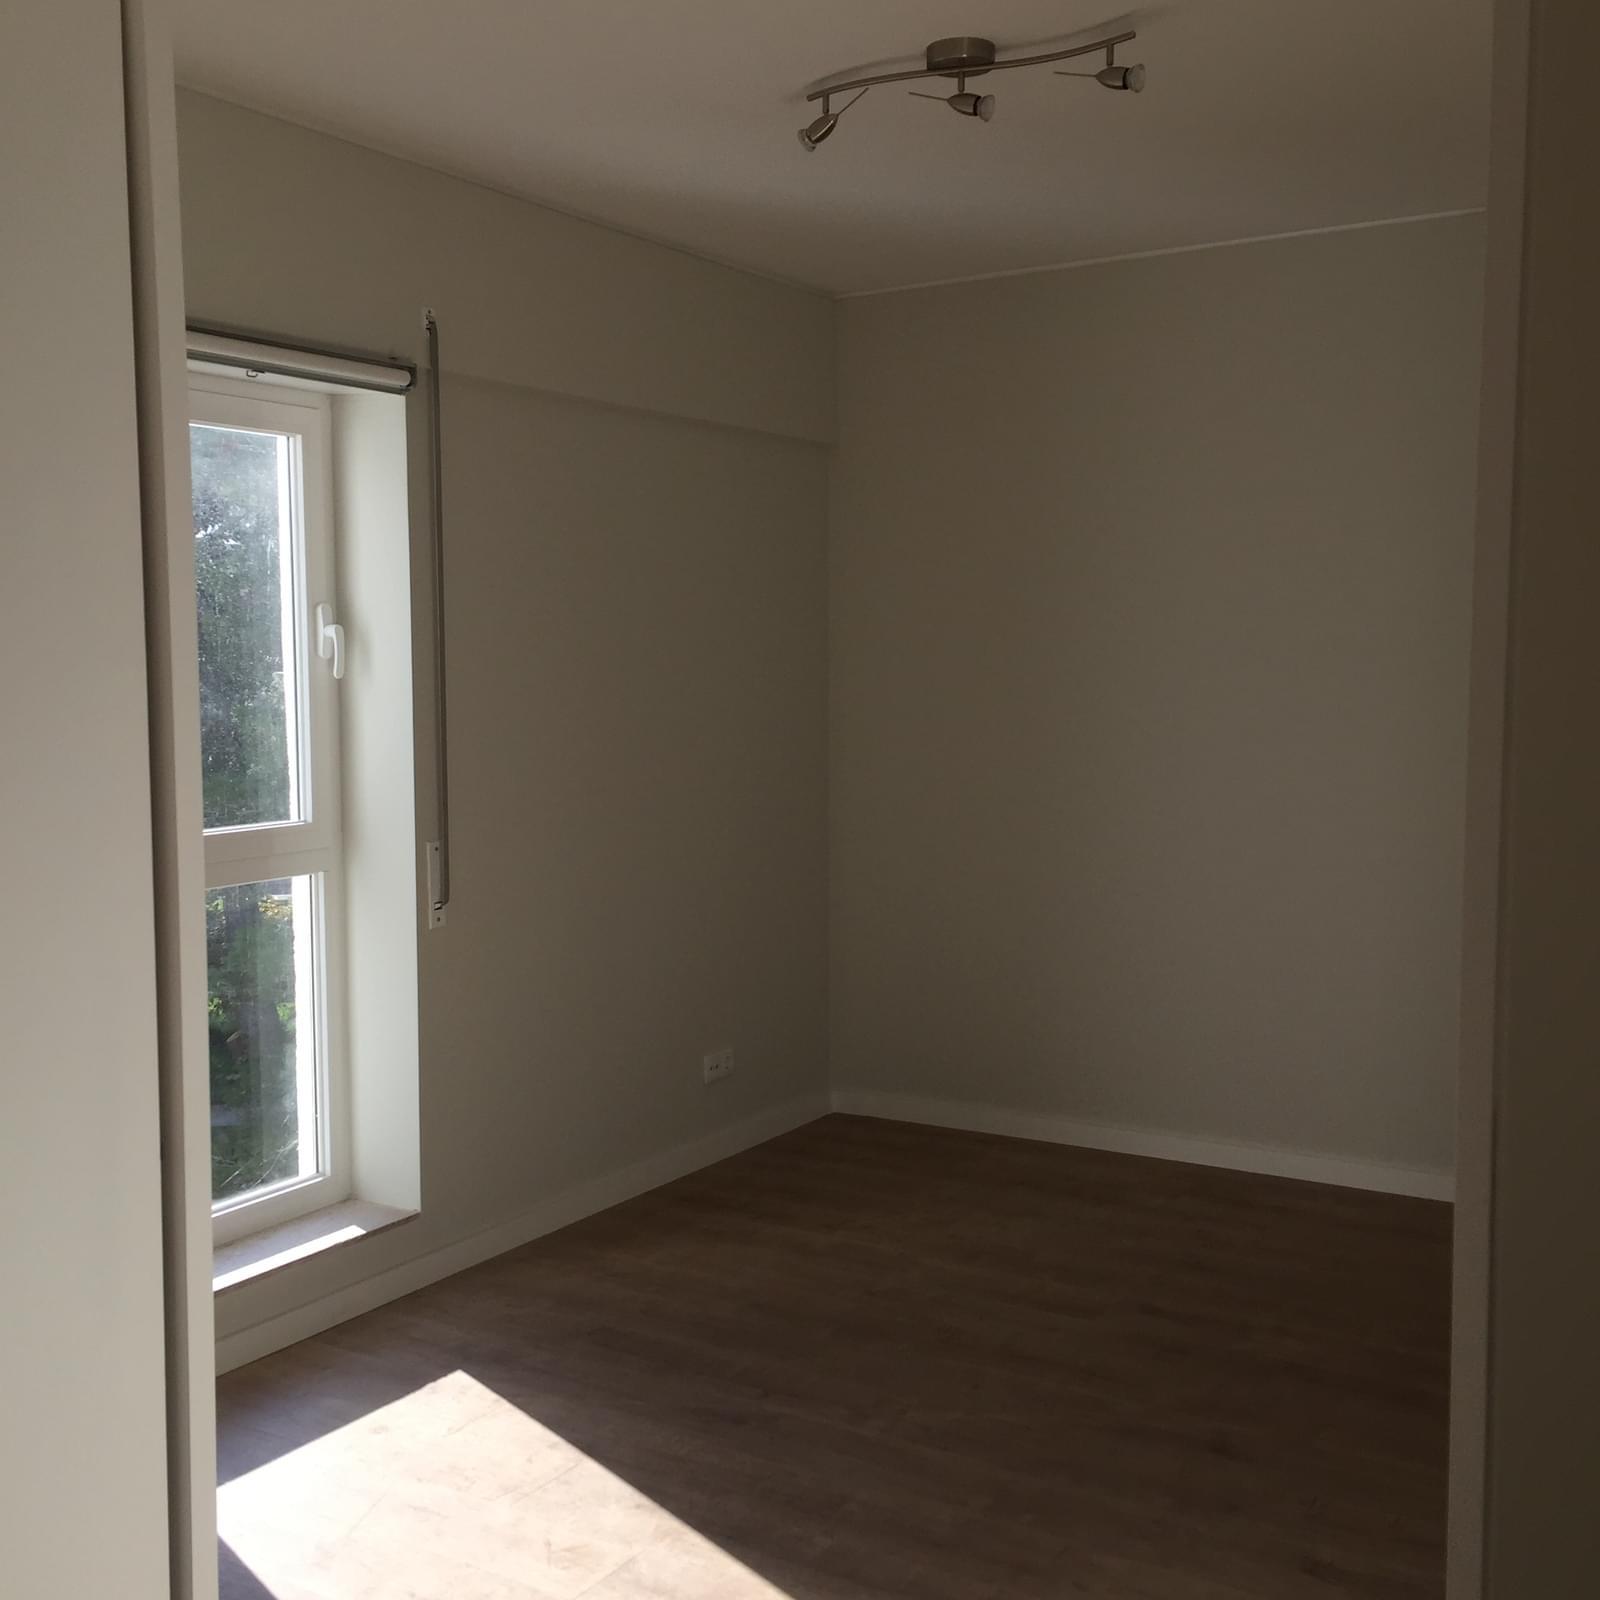 pf18756-apartamento-t2-cascais-d8dd4043-8746-41a4-8c94-ee2c31b3c282